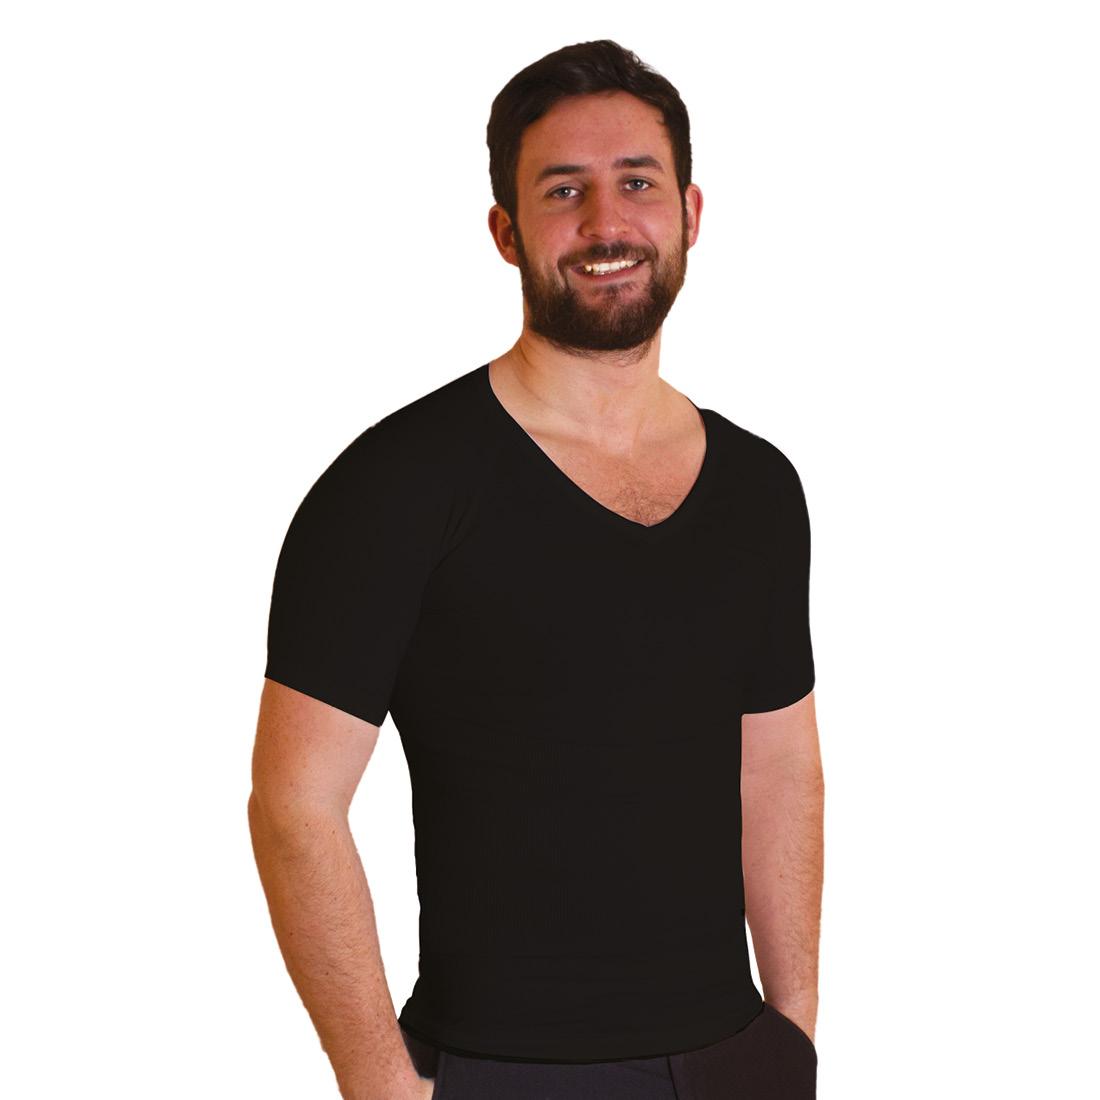 An image of Tone Tee Black T-shirt XXXL